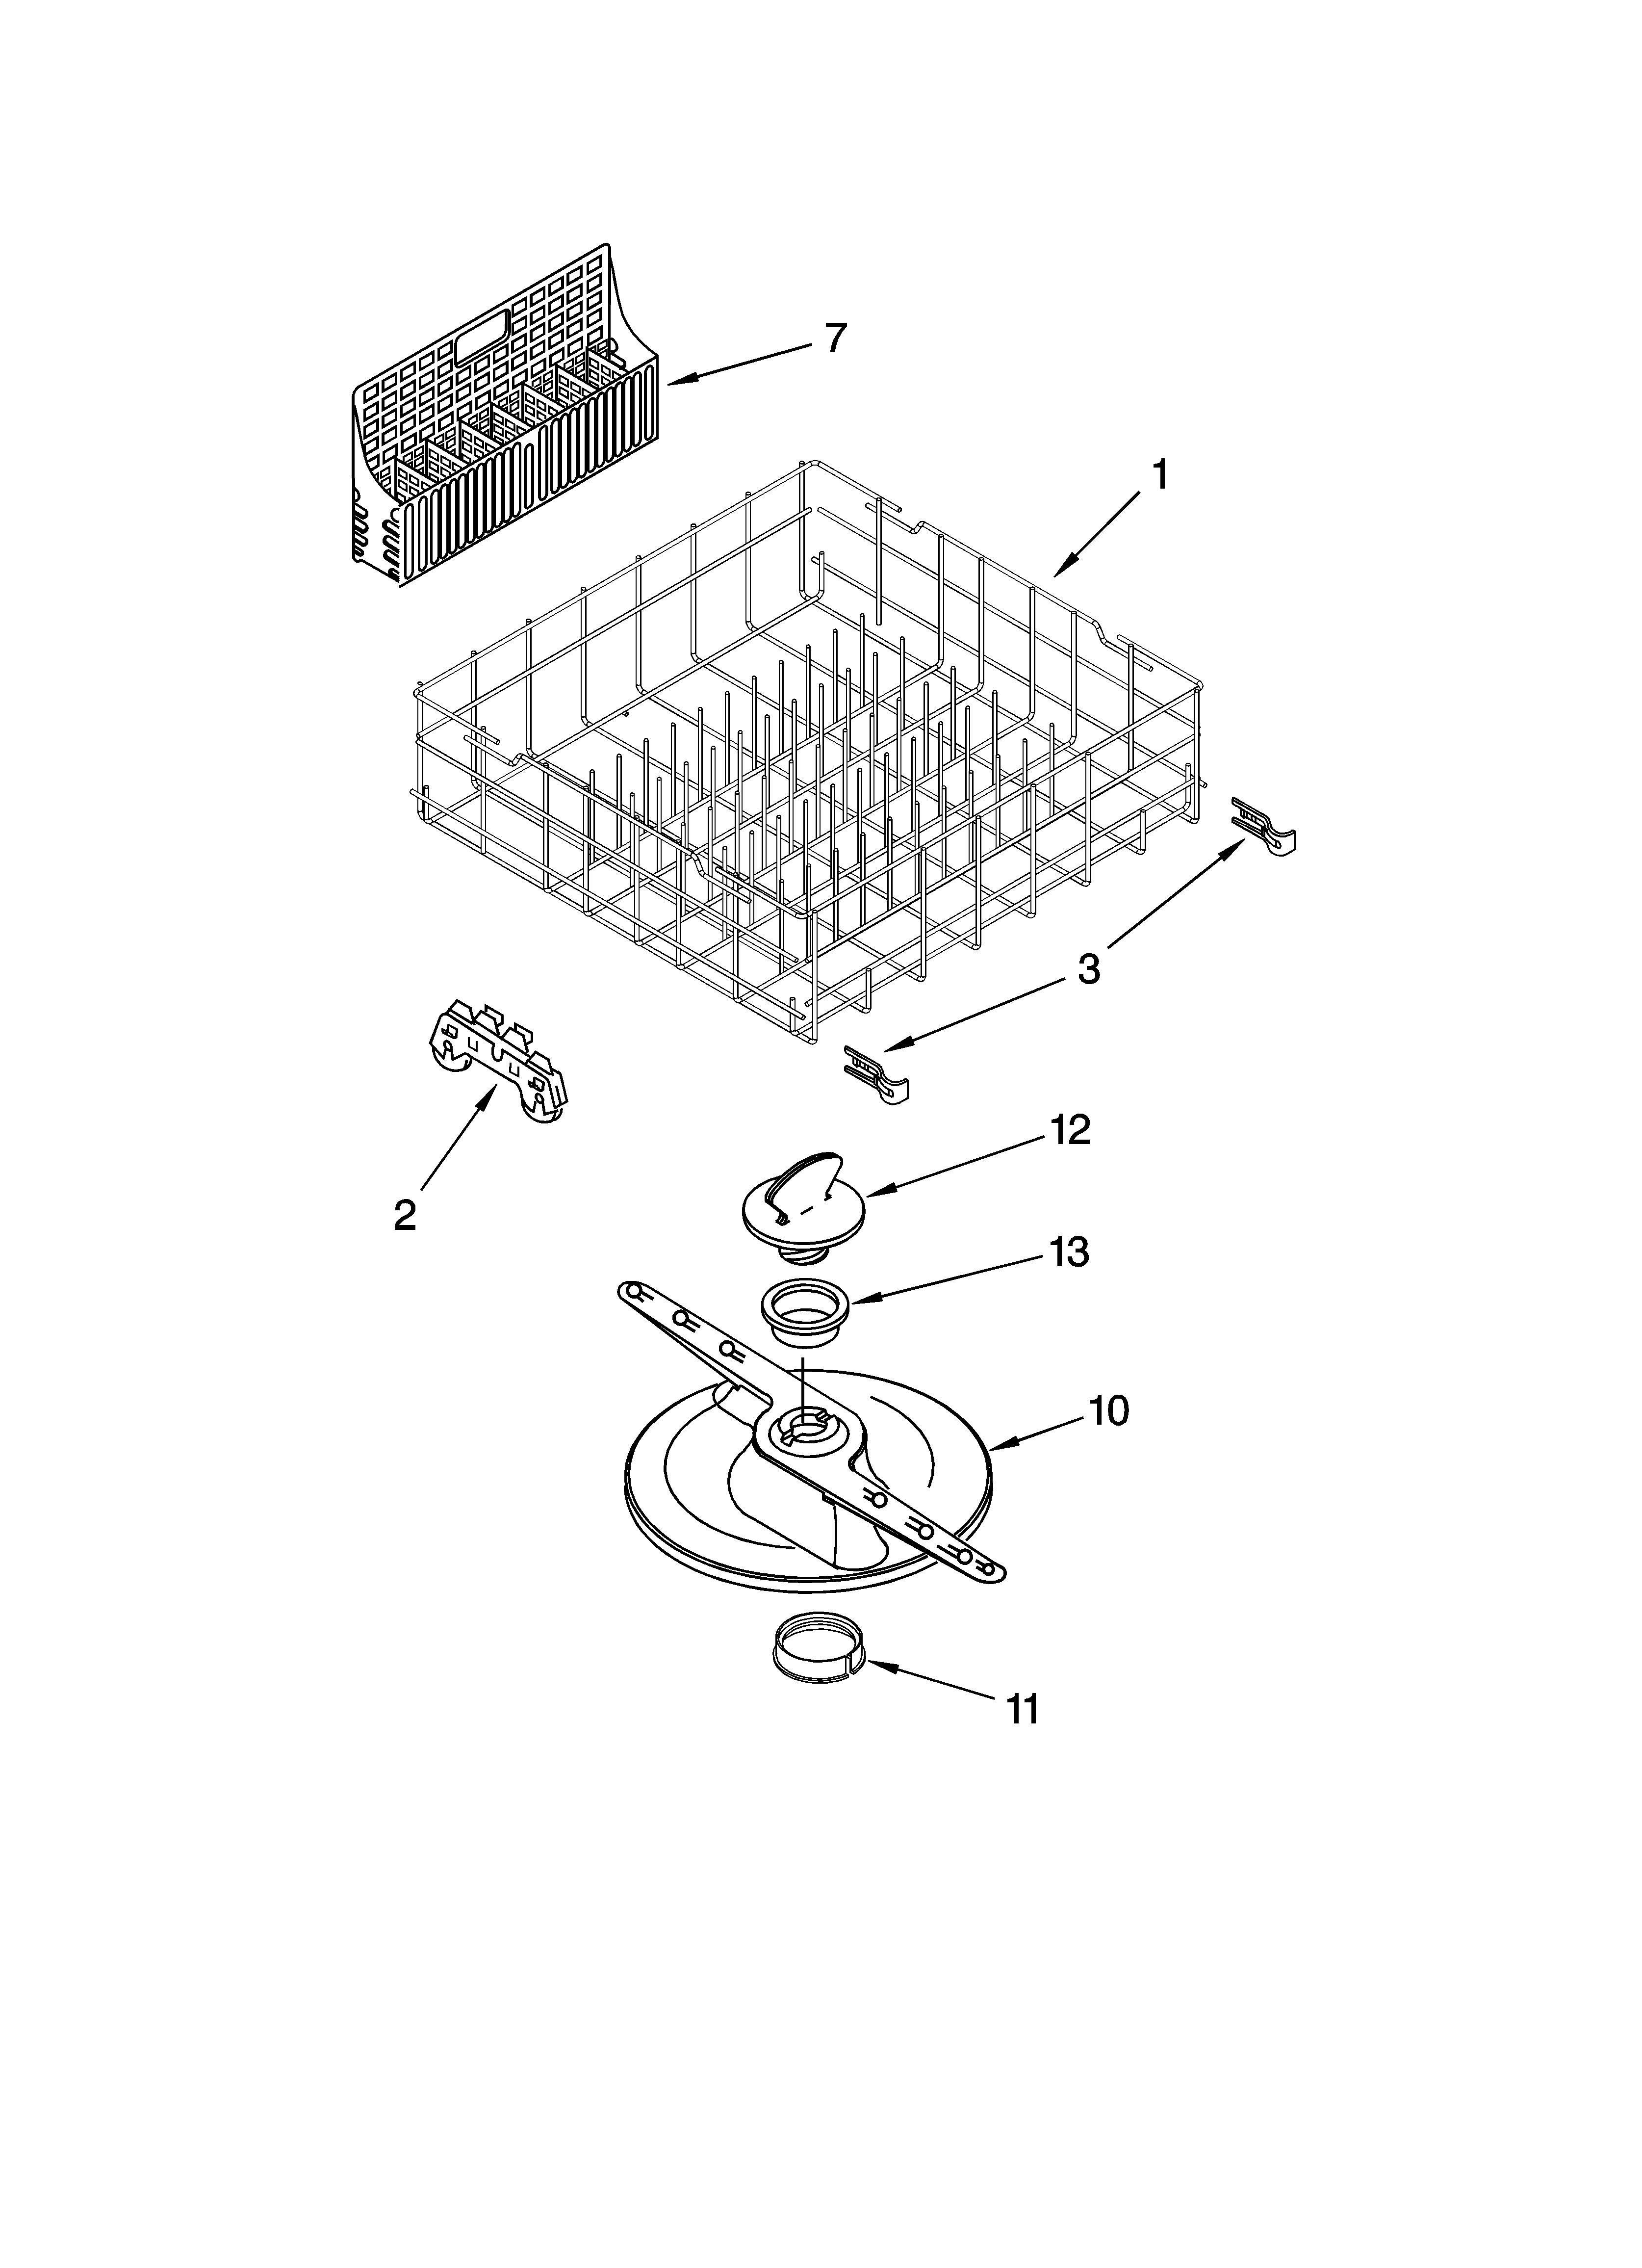 Kenmore Dishwasher Model 665 Parts Diagram